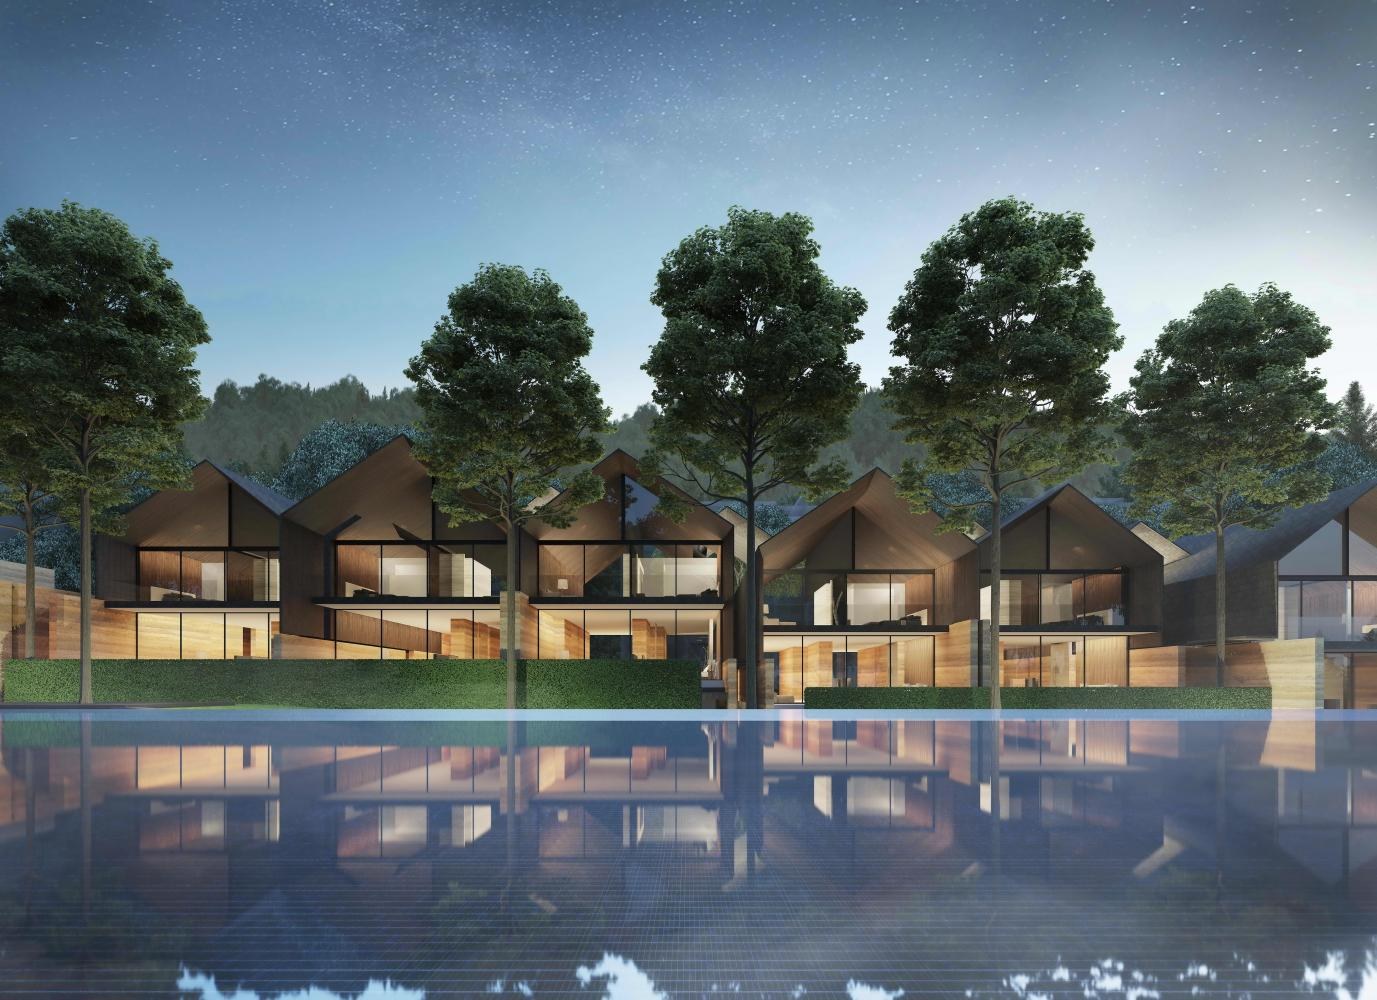 An artist's rendition of Akas Villa Khaoyai, a condo resort project on a four-rai plot in Khao Yai with 23 villa-style condo units.